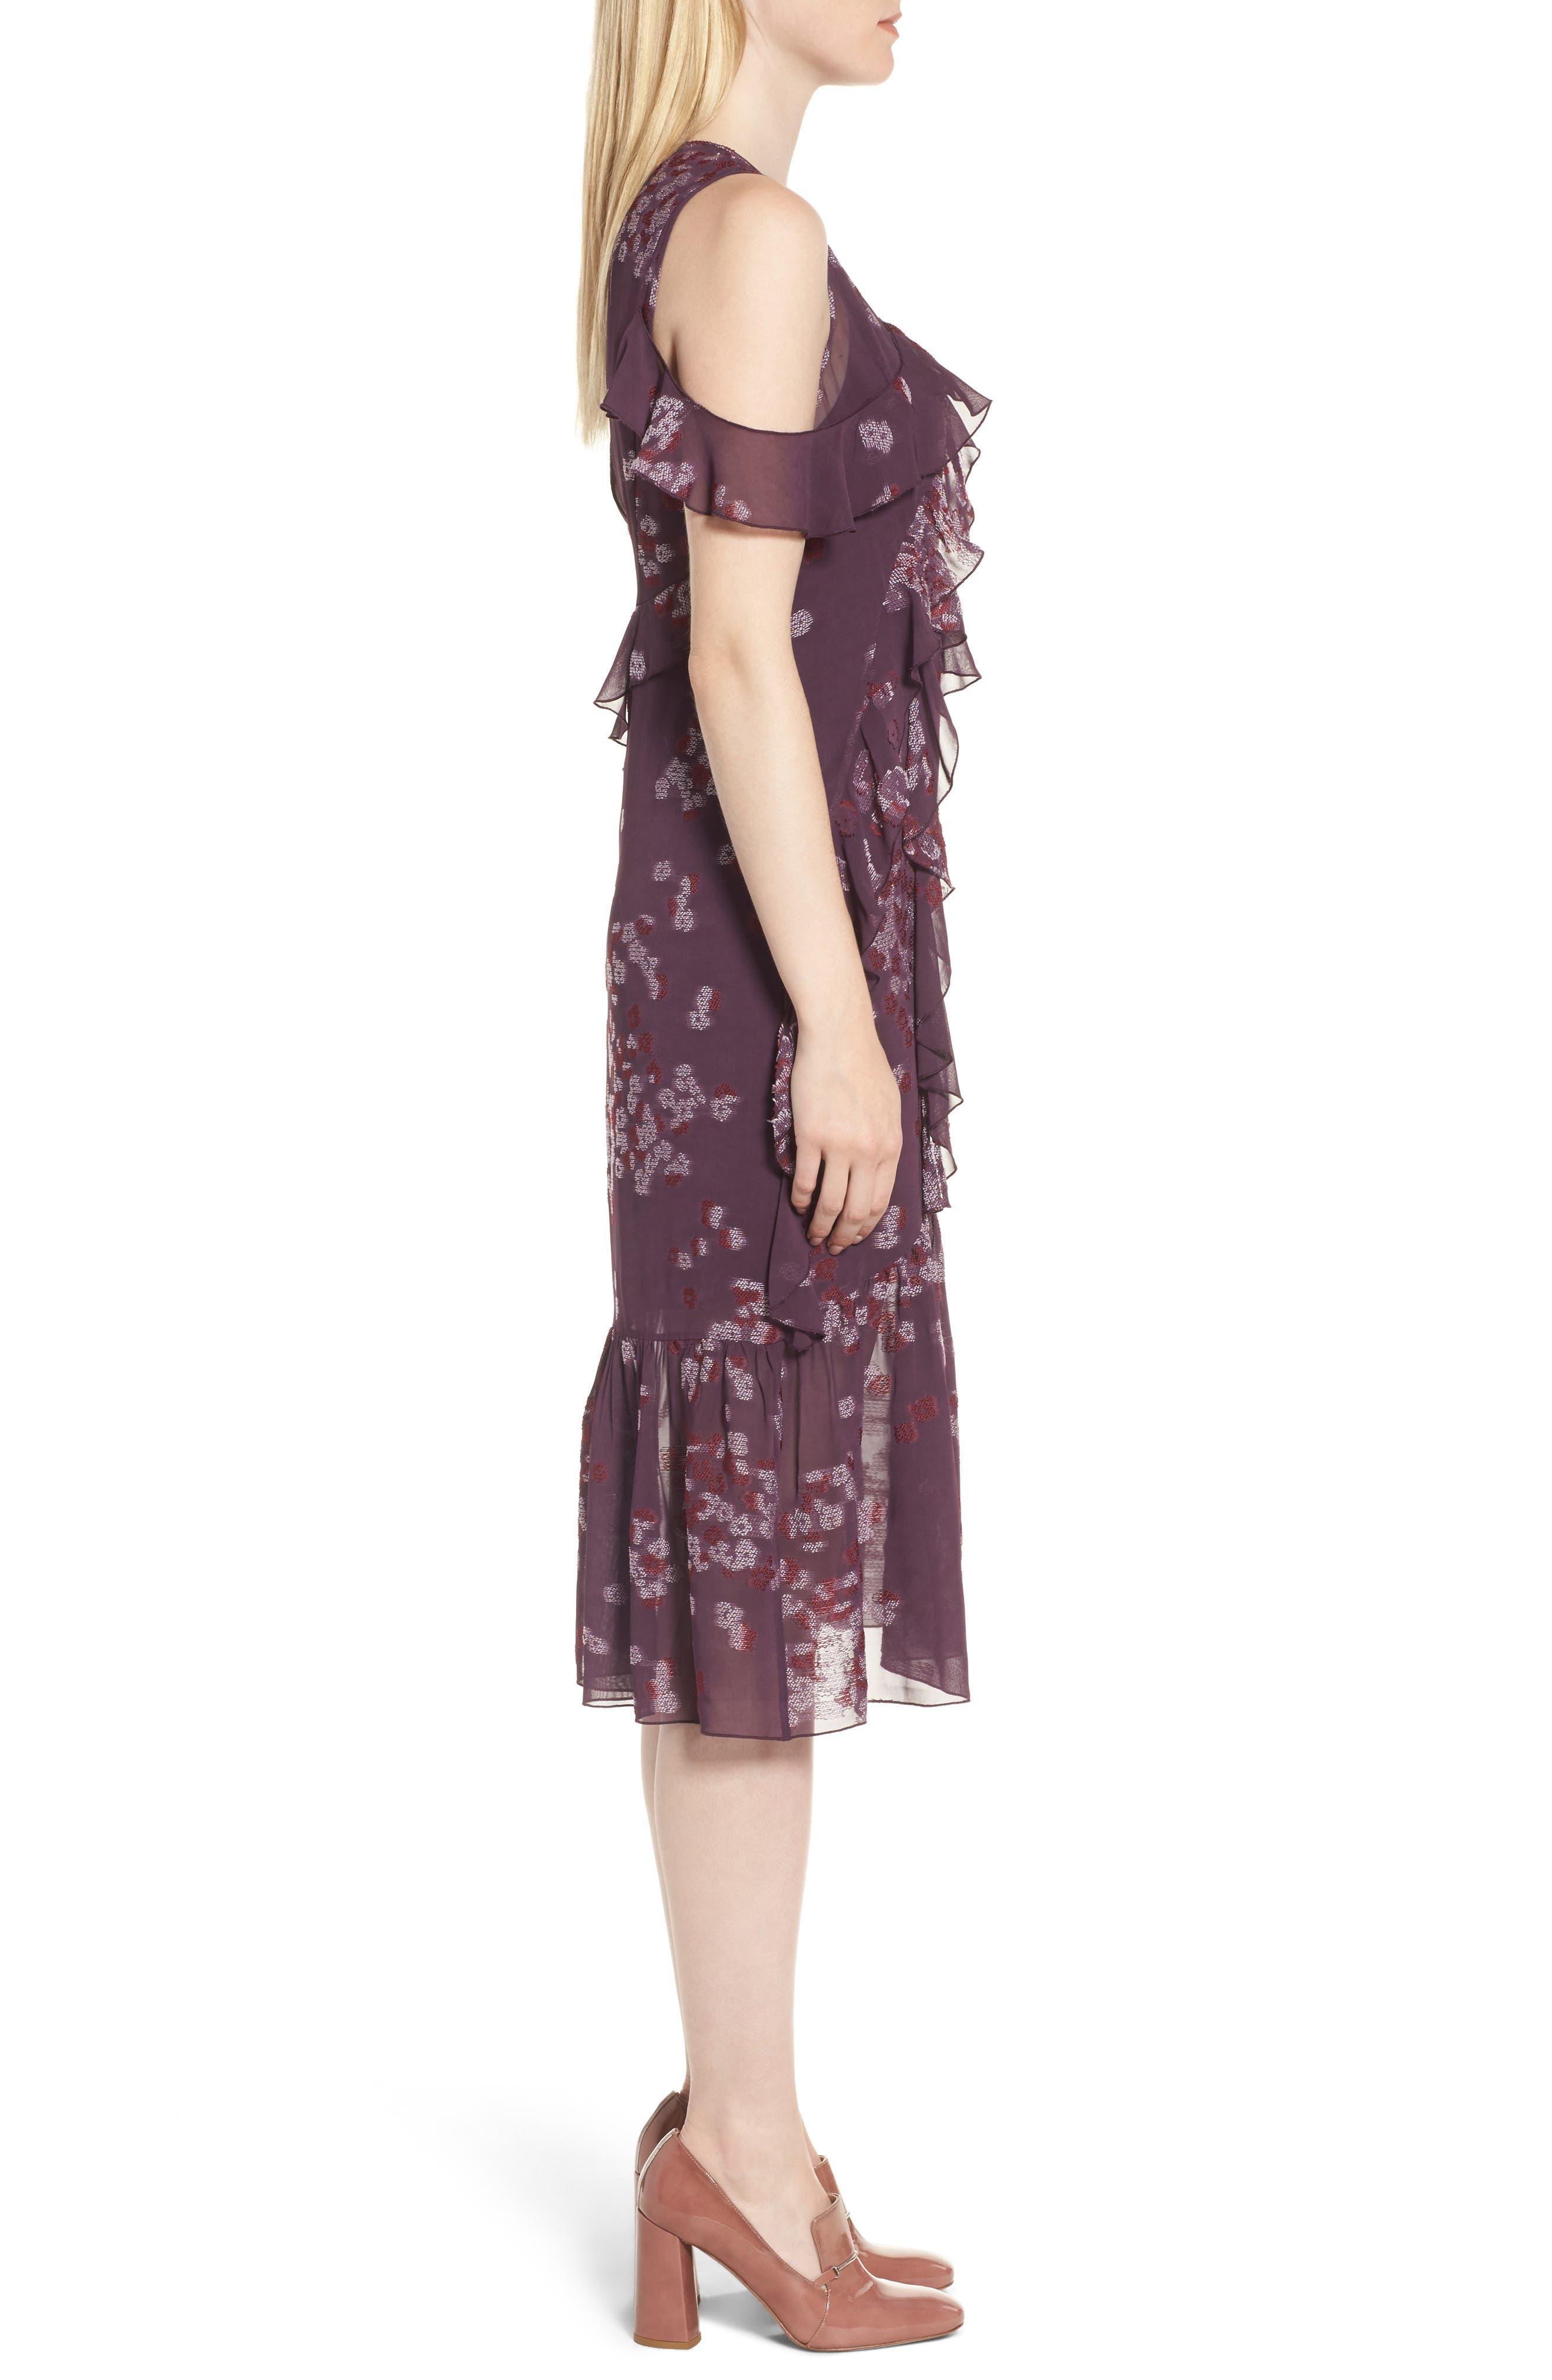 Jacquard Ruffle Dress,                             Alternate thumbnail 3, color,                             Purple Plum Scattered Floral